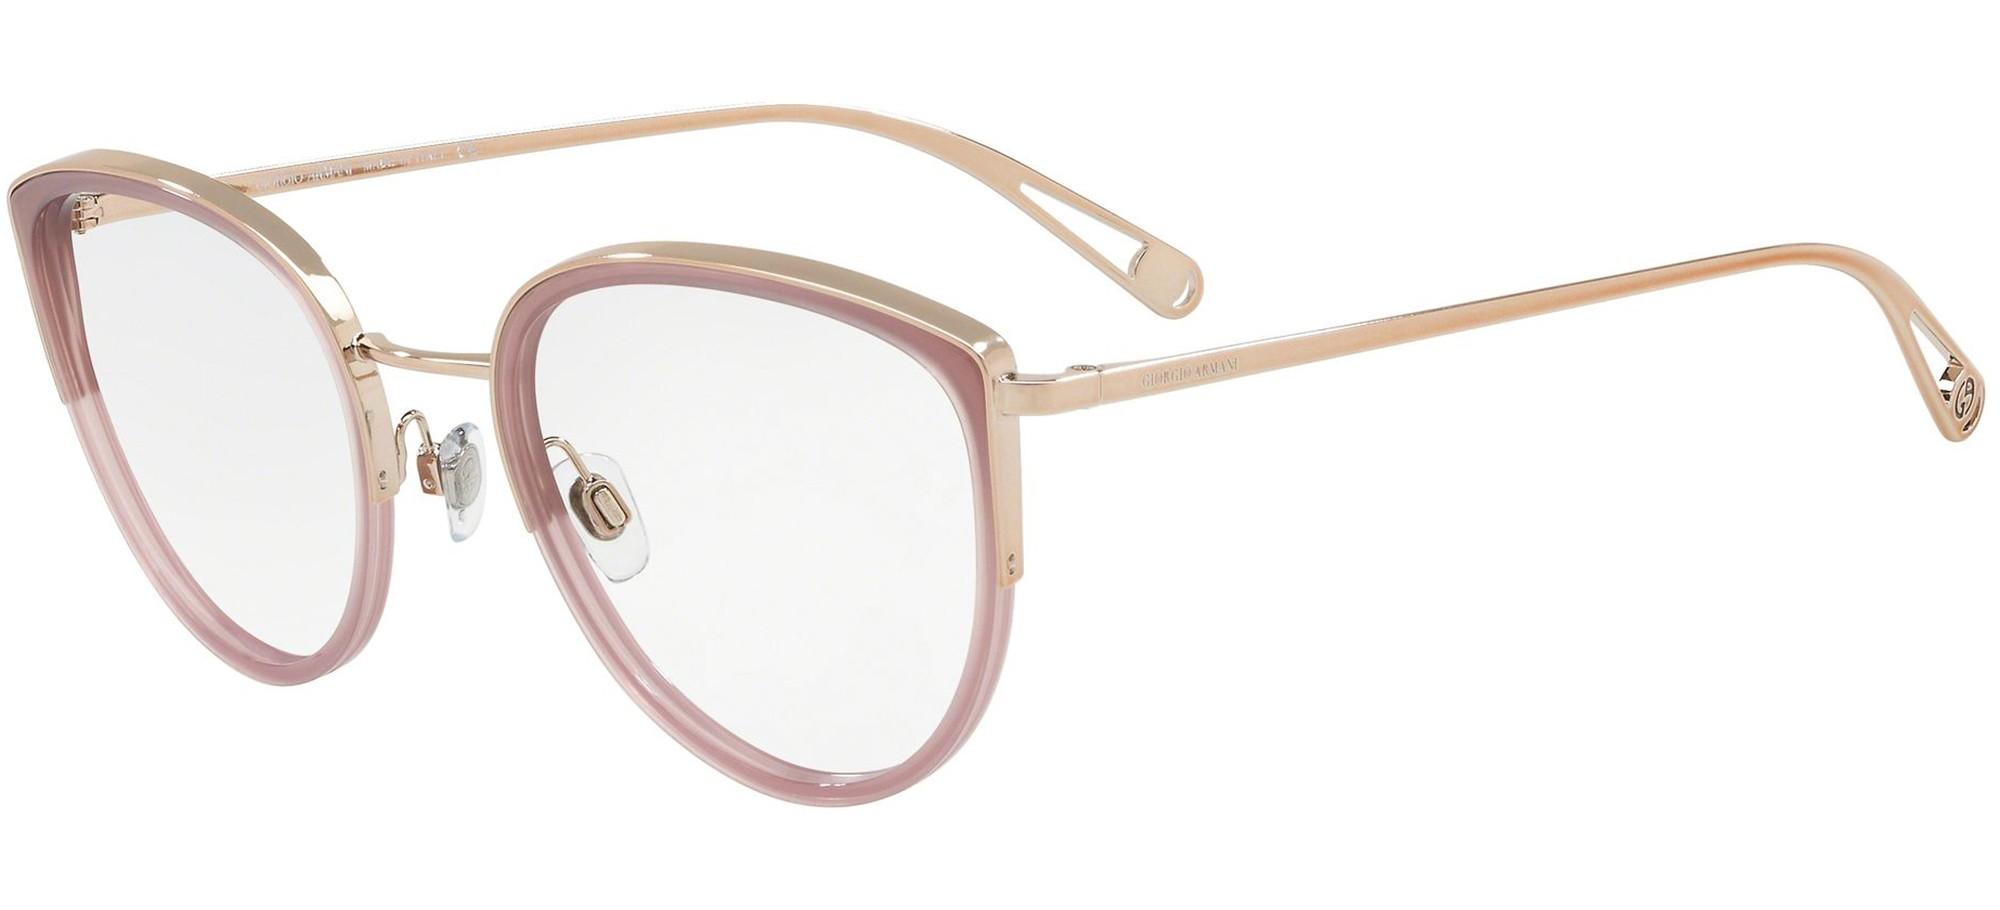 Giorgio Armani eyeglasses AR 5086